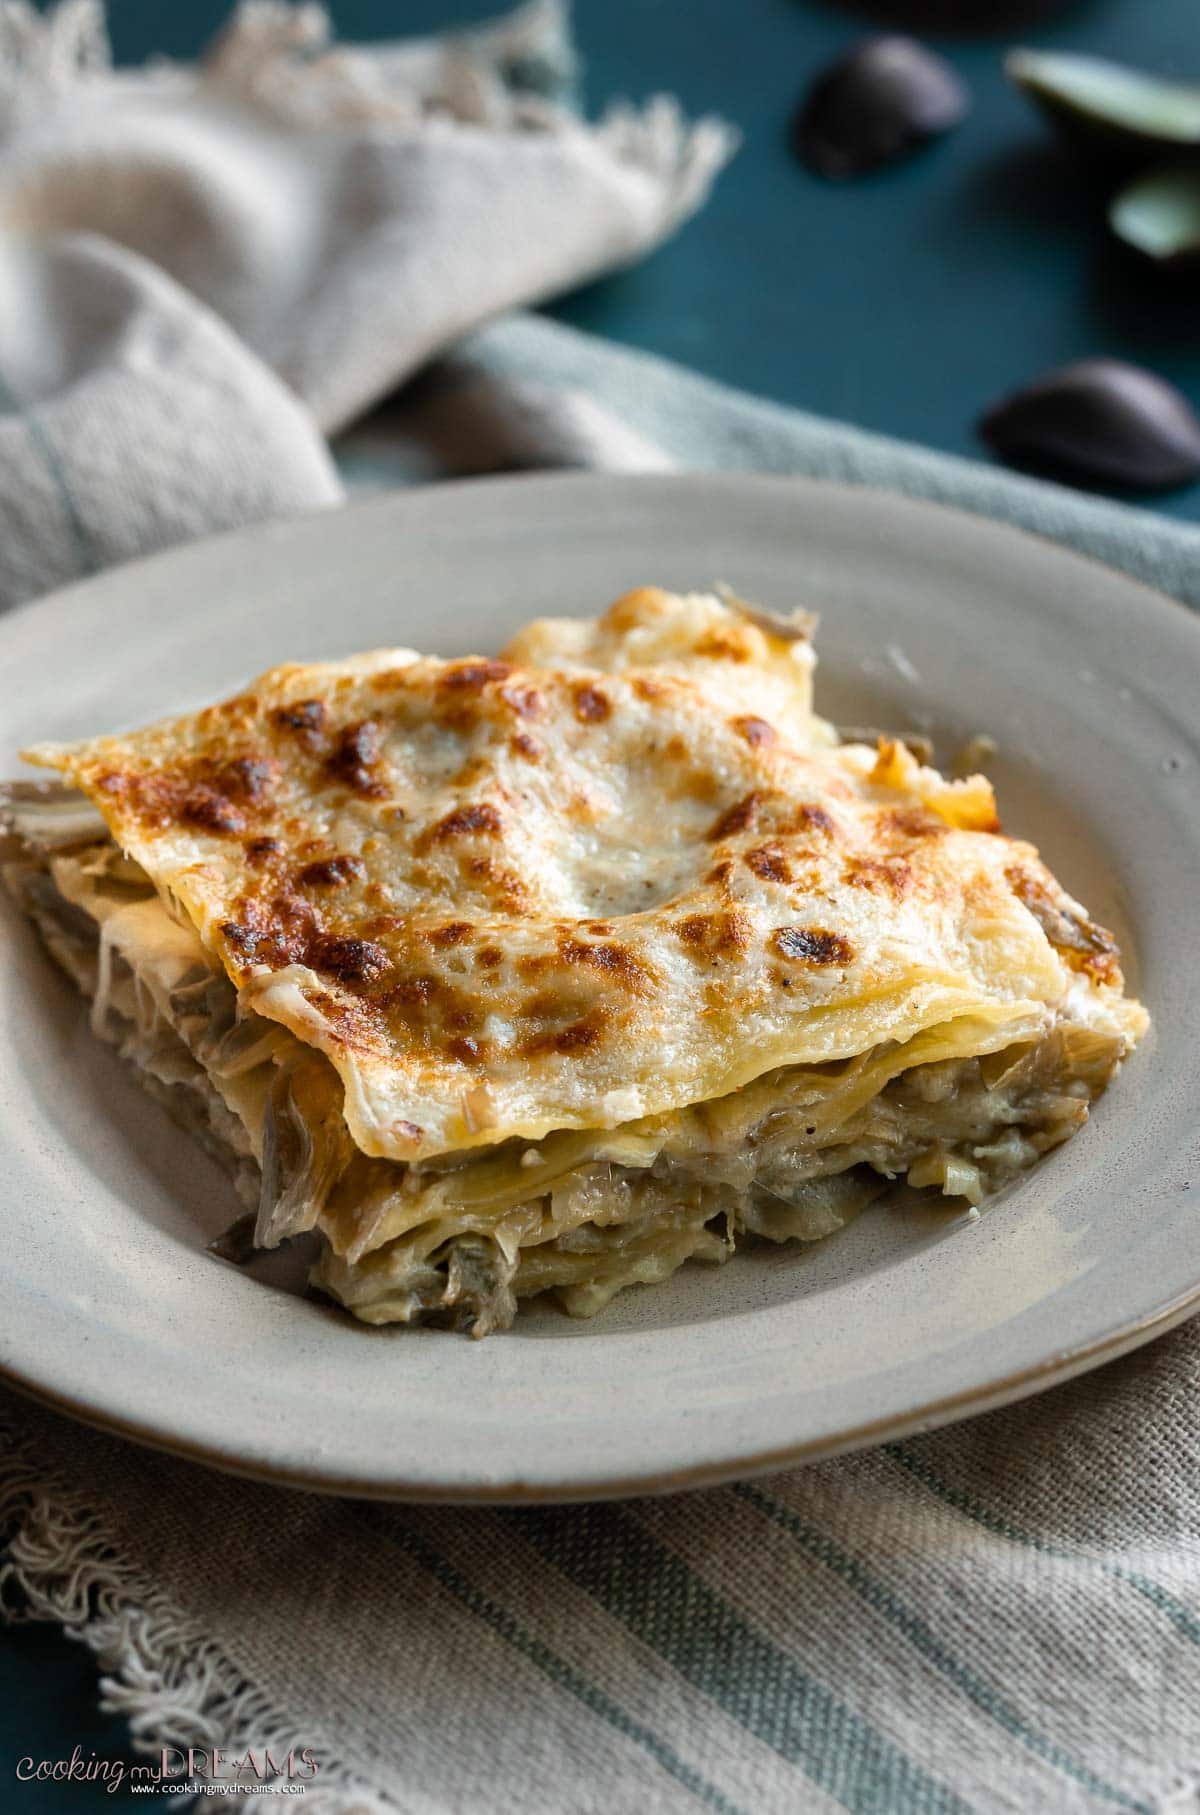 portion of artichoke lasagna on a plate